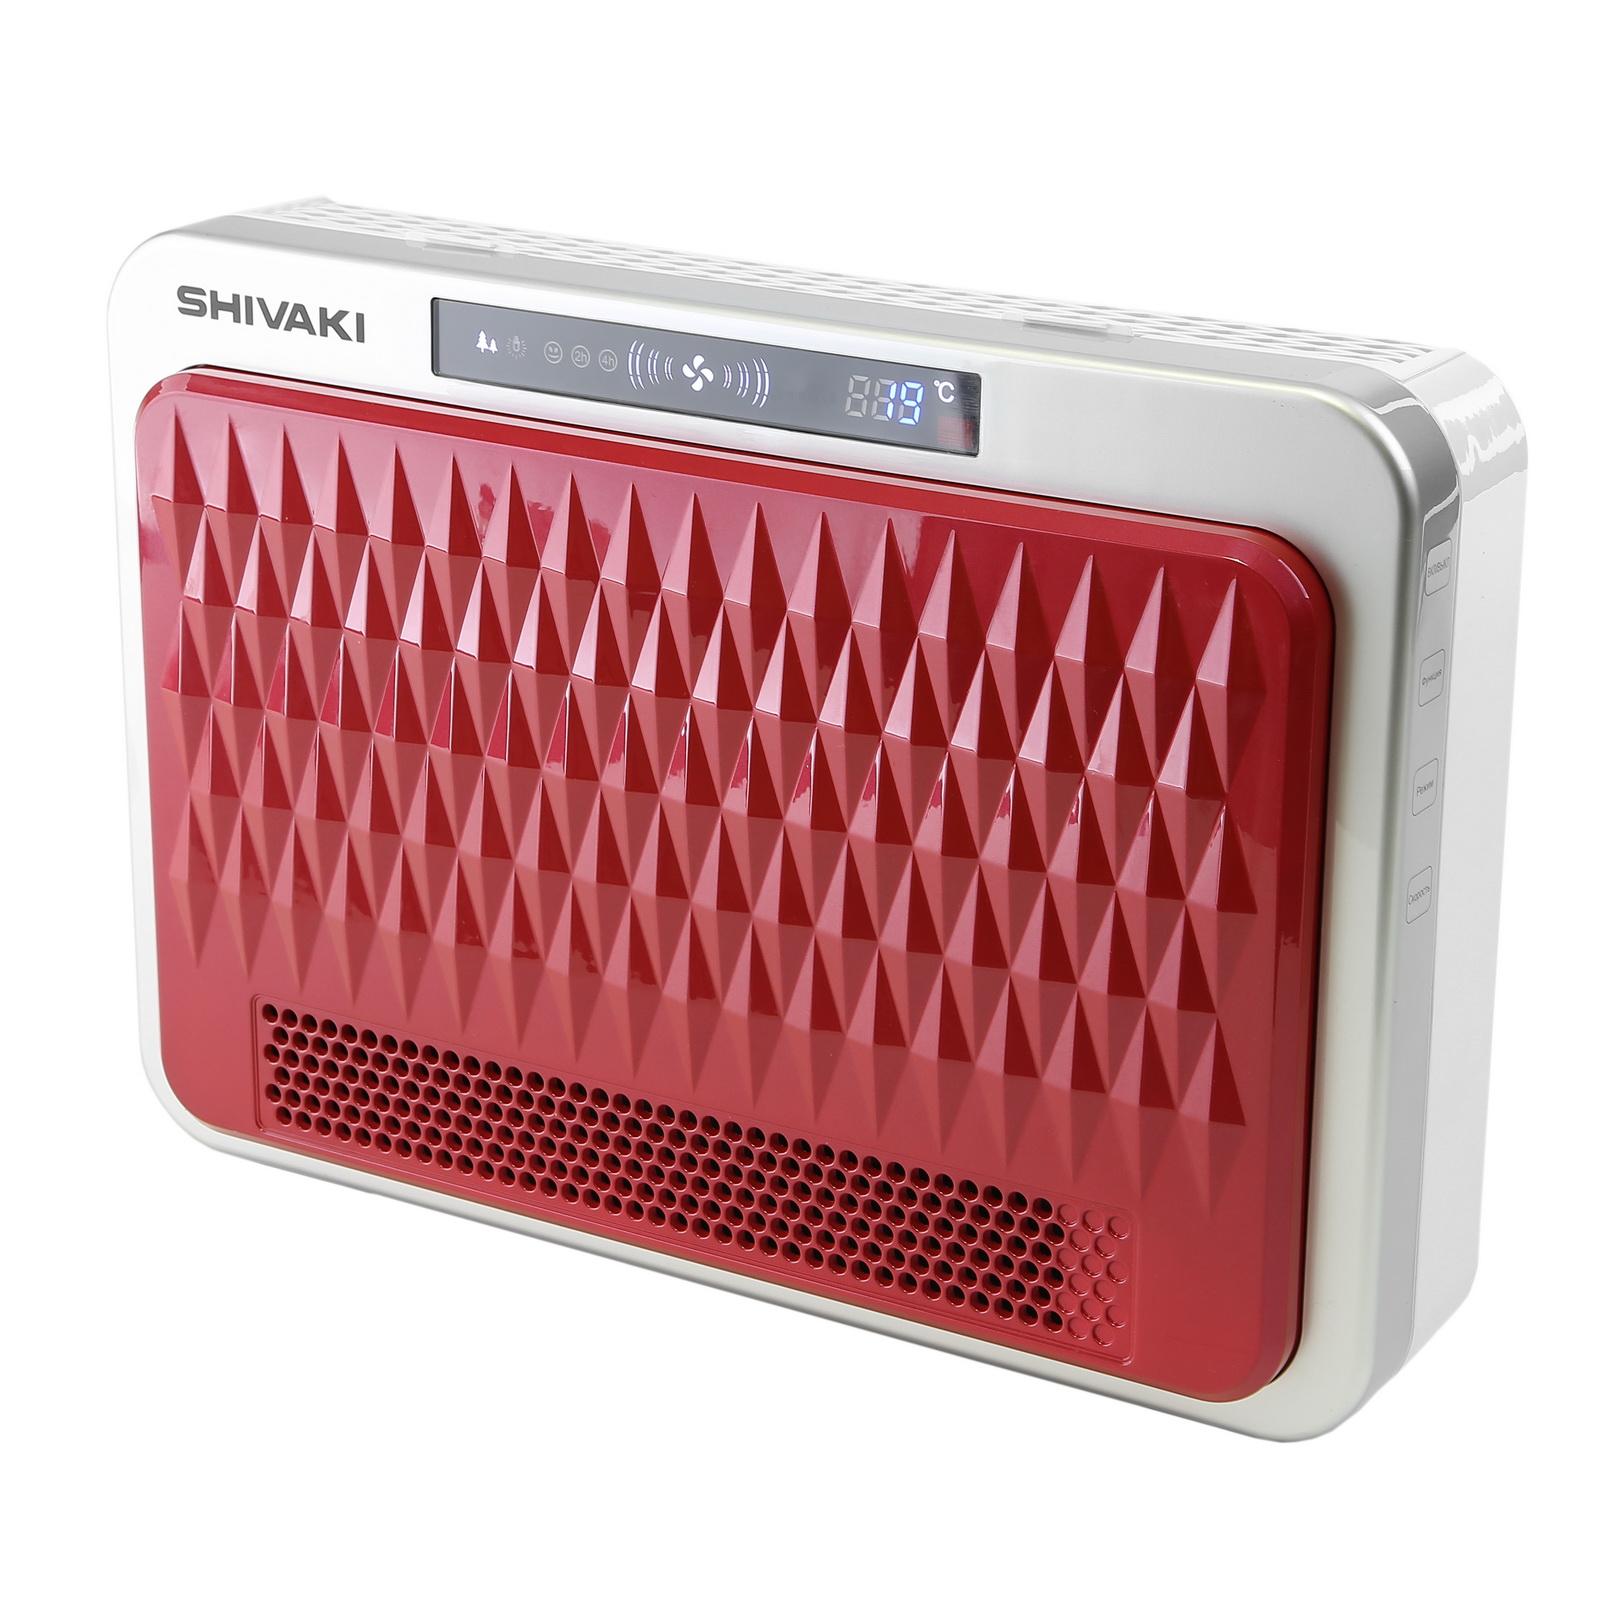 Воздухоочиститель Shivaki Shap-3010r